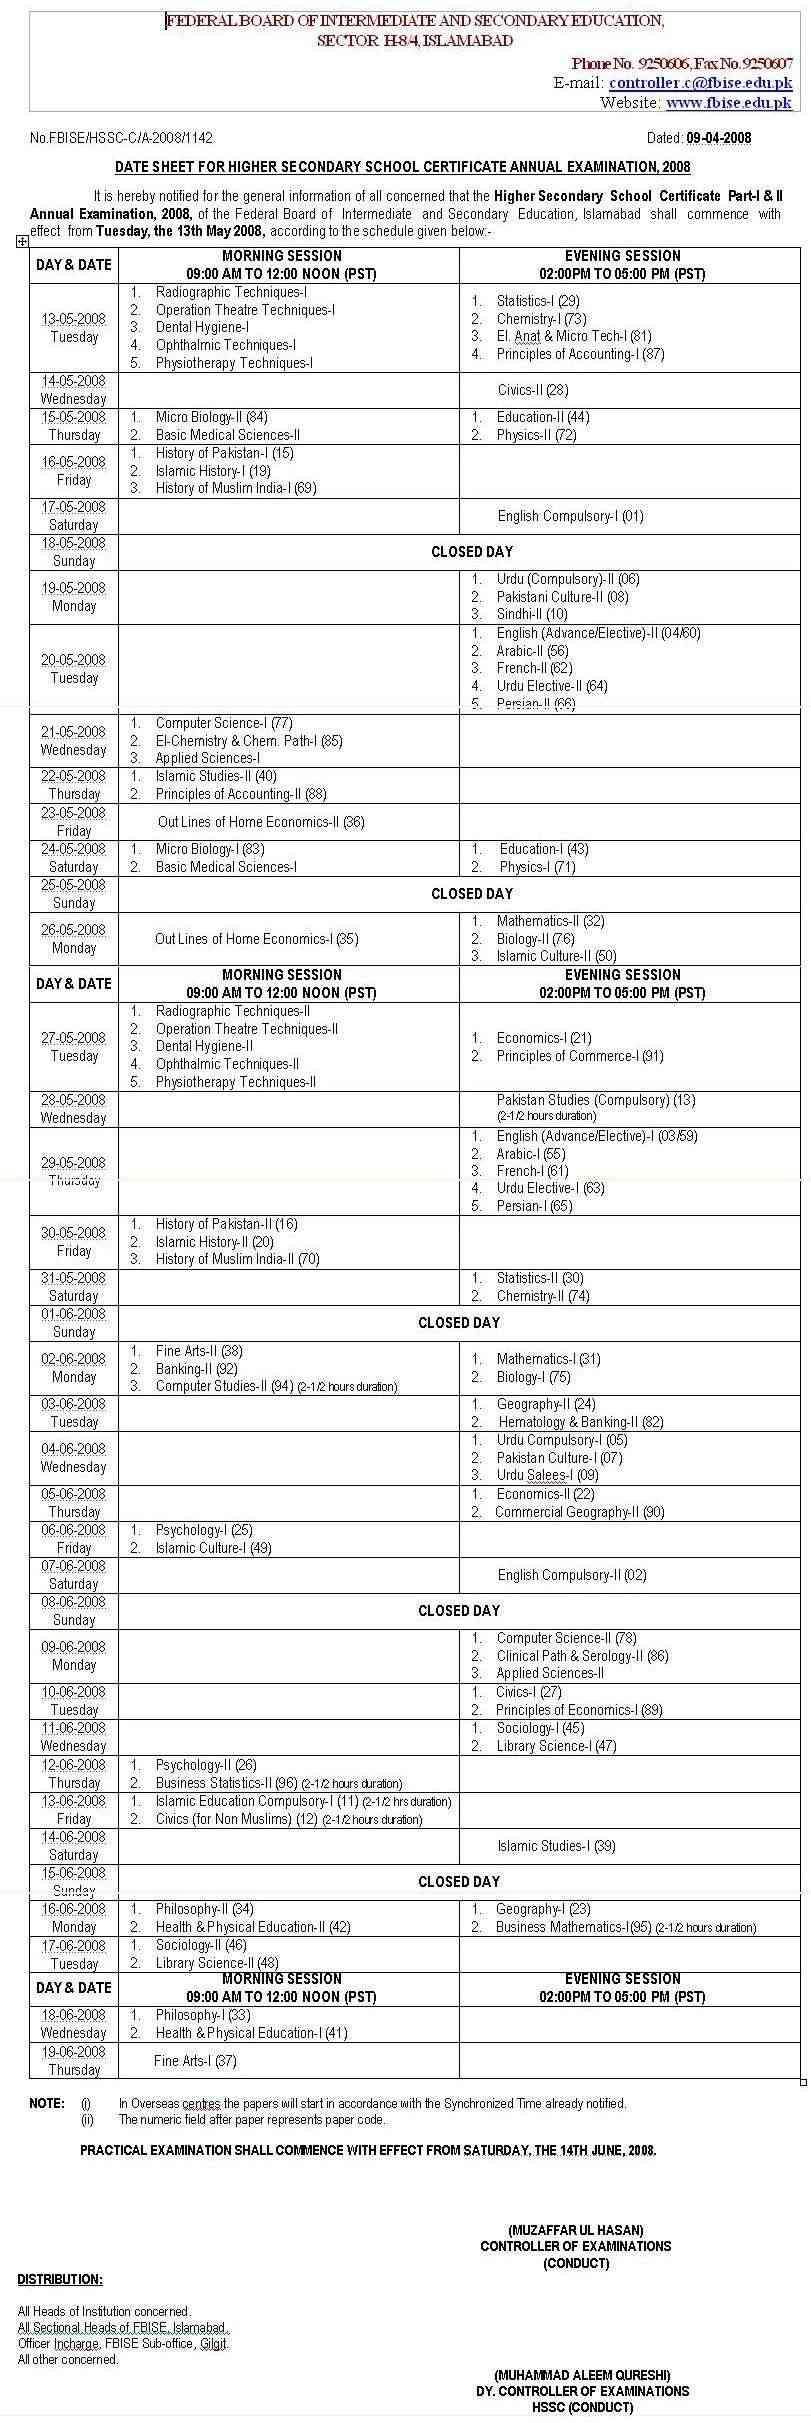 HSSC DATE SHEET 2008 Board_10